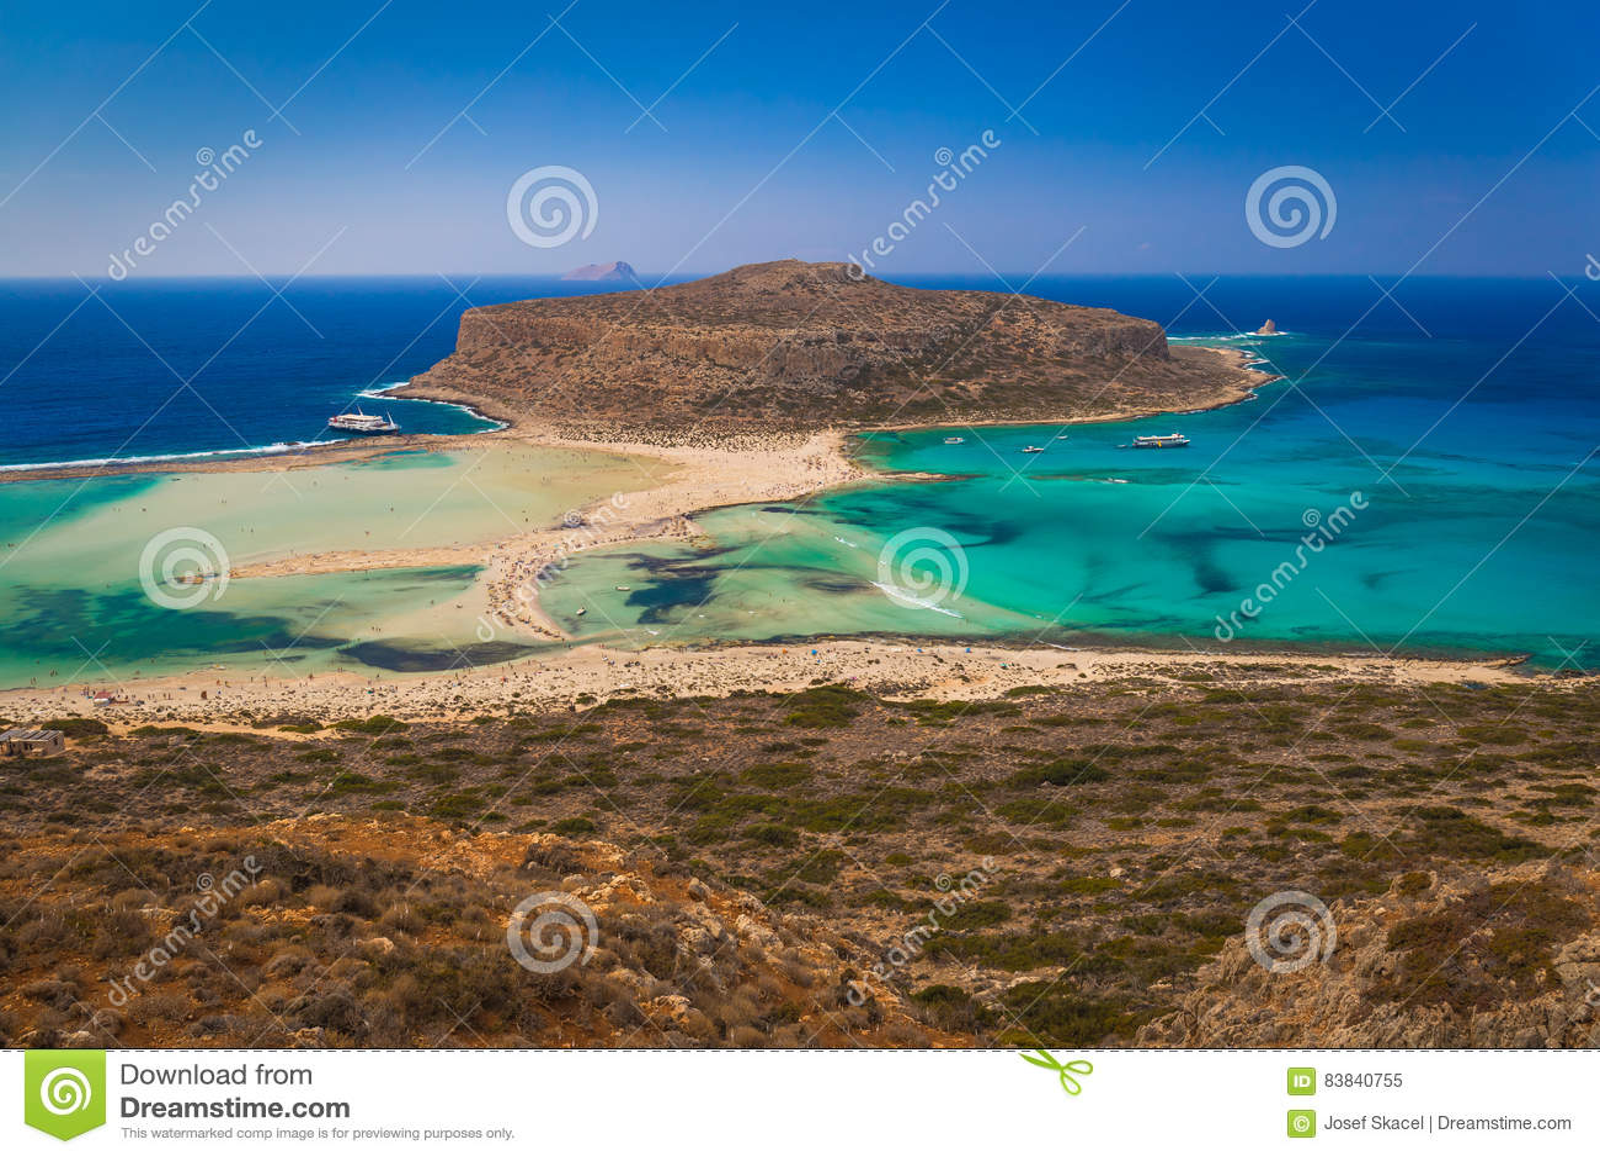 Balos beach and lagoon, Chania prefecture, West Crete, Greece